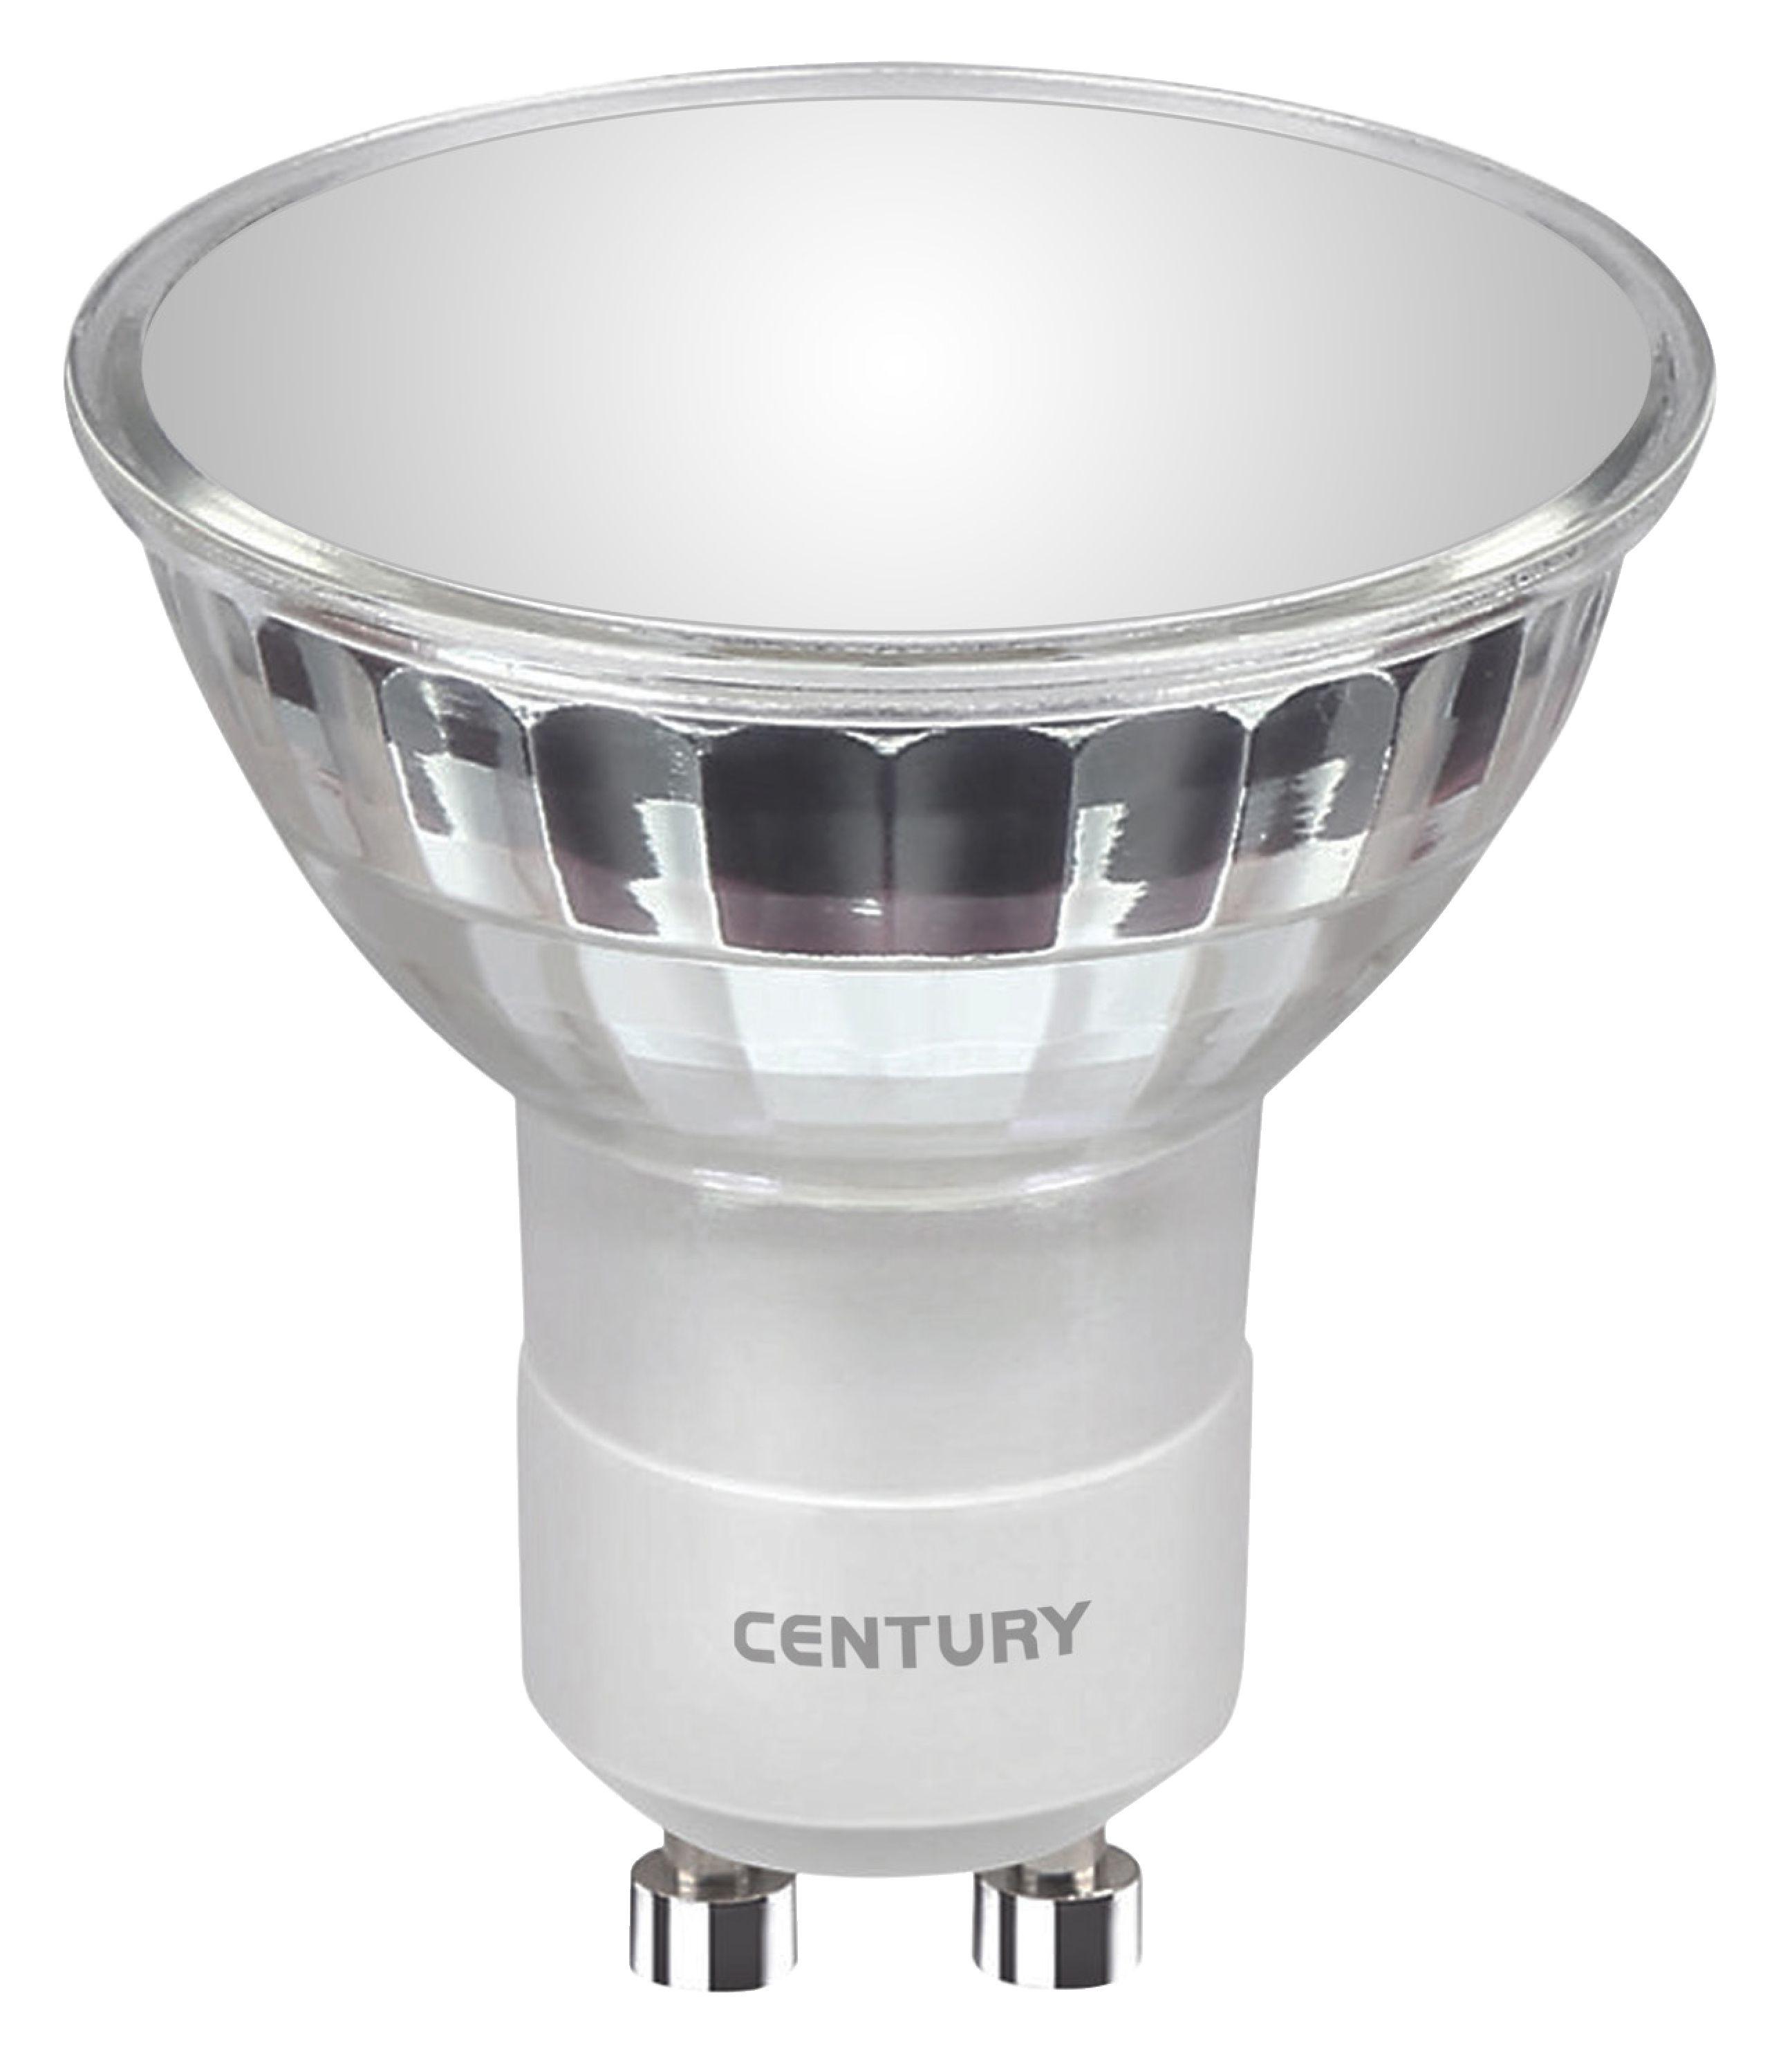 Century LED žárovka GU10 5W 400lm 2700K (HRK110-051027)